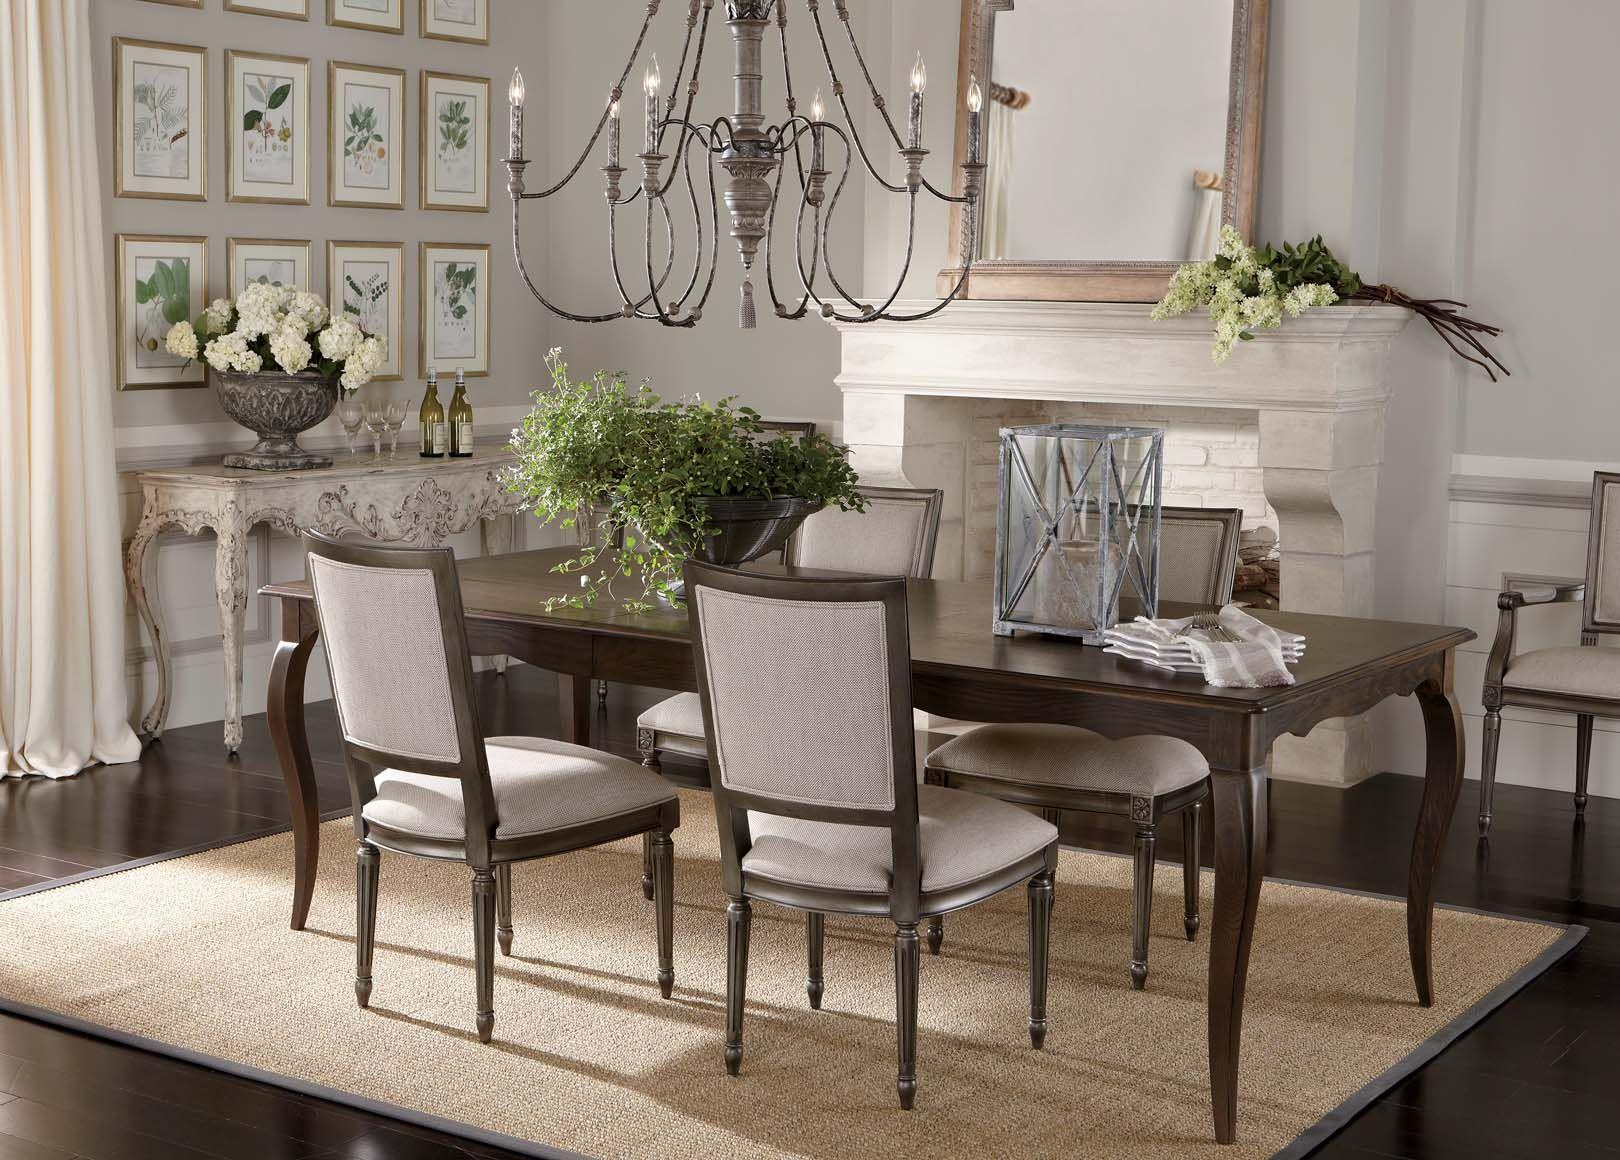 Furniture furthermore dining room china cabi ethan allen furniture on - Bijou Bistro Dining Room Ethan Allen